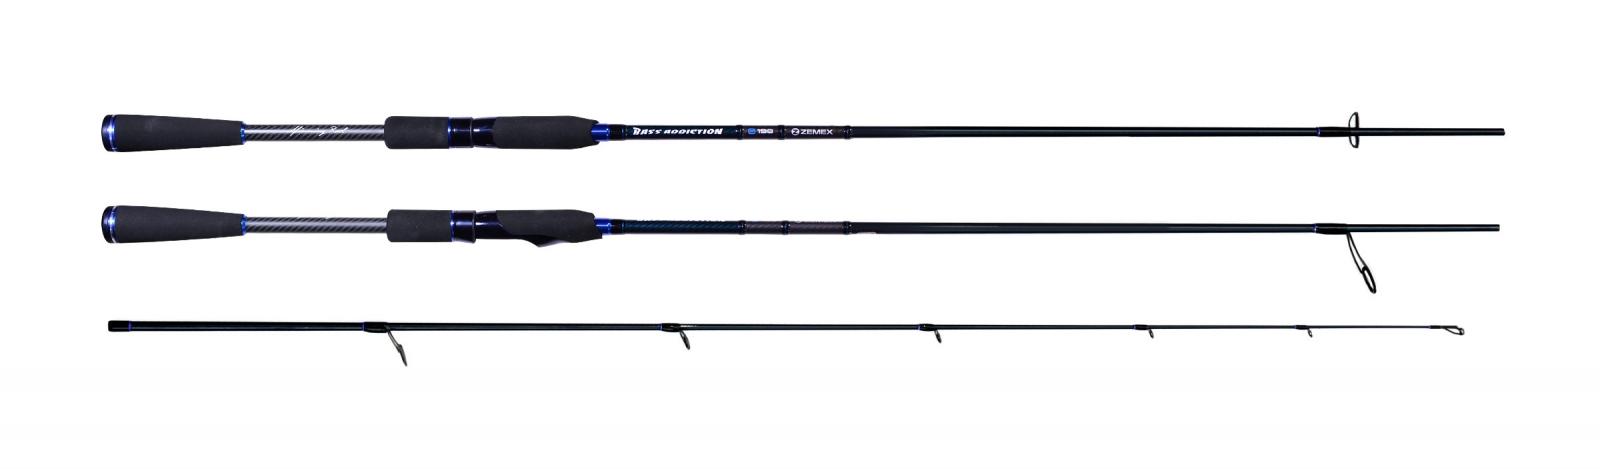 Спиннинг Zemex Bass Addiction S-752M NEW 2015 2,25 м. 7,0-25,0 гр.